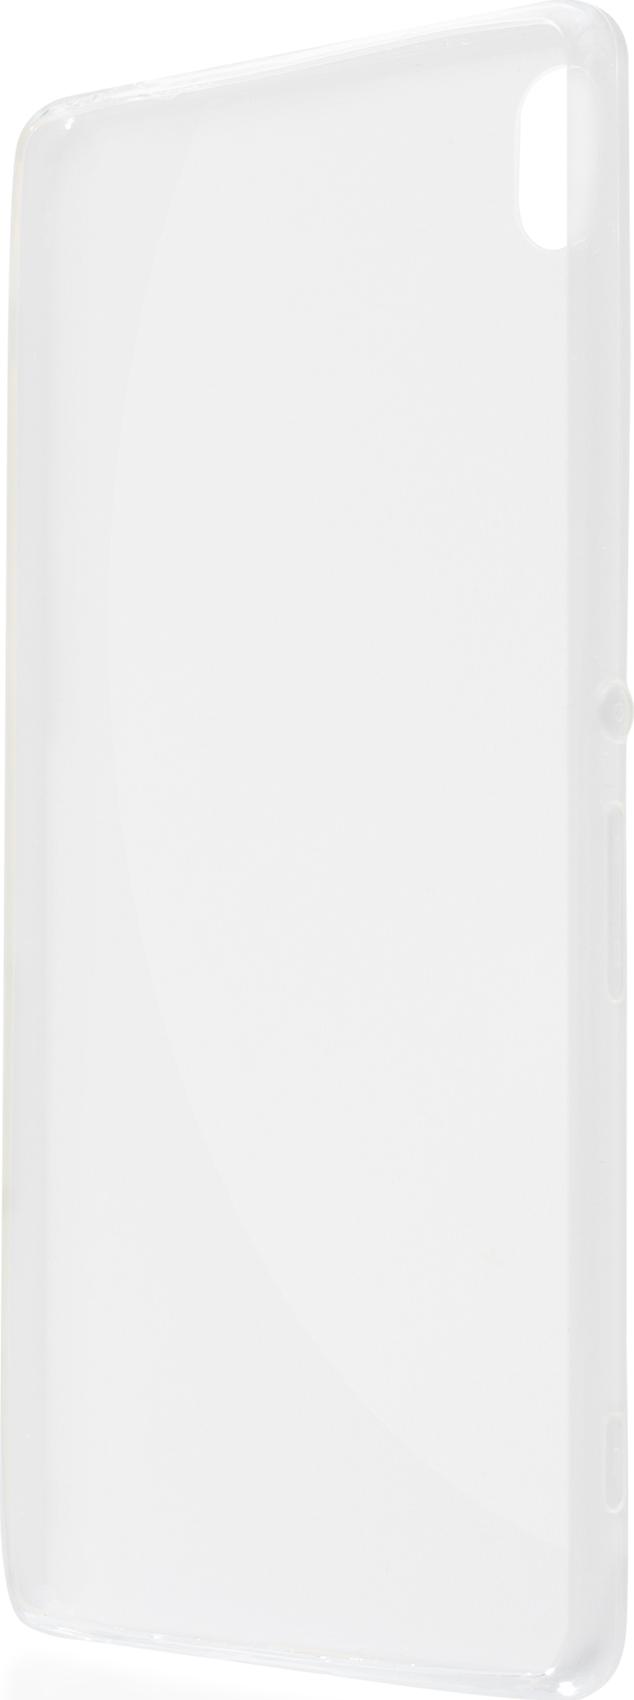 Чехол Brosco TPU для Sony Xperia XA Ultra, прозрачный icovercase синий sony xperia xa